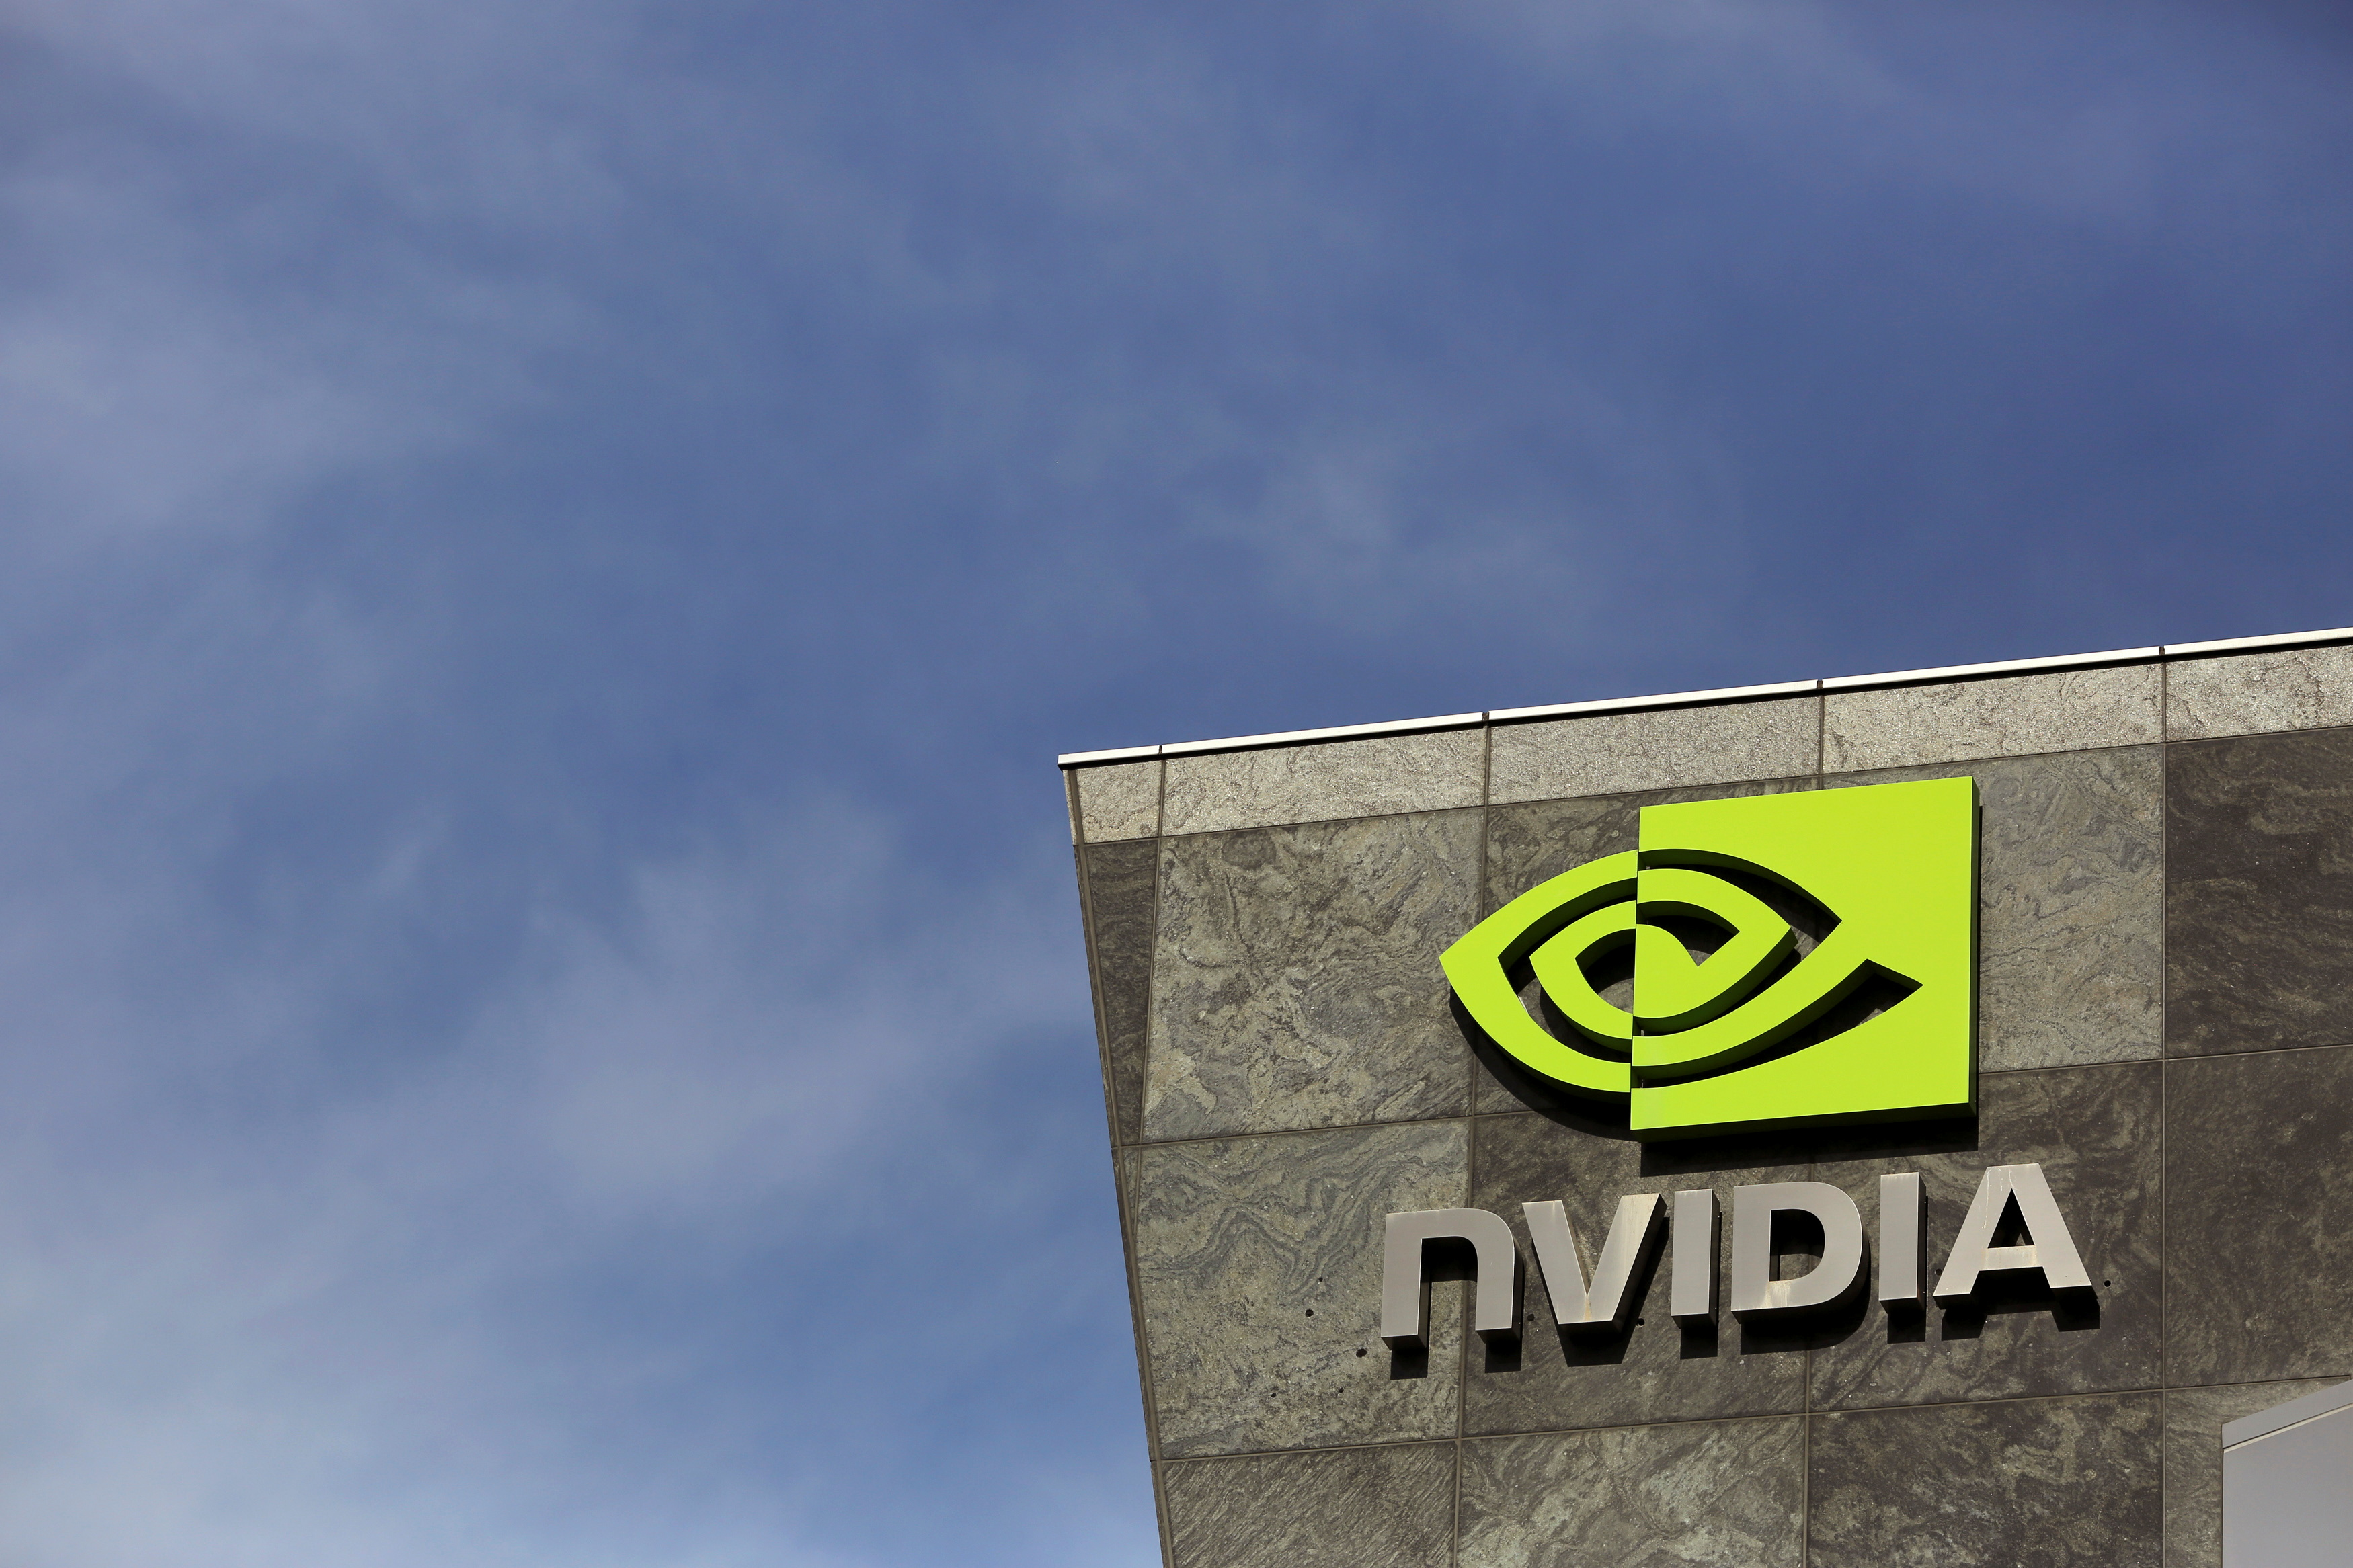 The Nvidia headquarters in Santa Clara, California February 11, 2015. REUTERS/Robert Galbraith